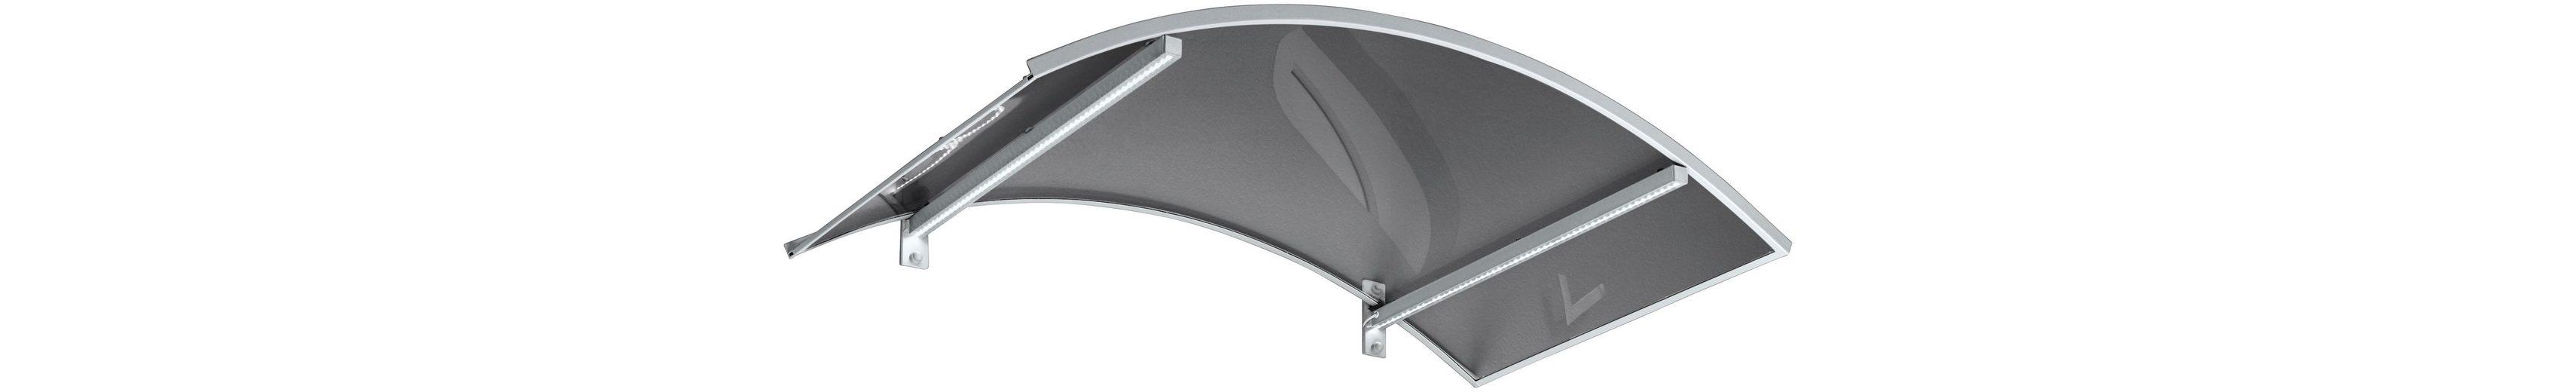 Pultvordach »LED-Technik«, 150x90x22 cm, weiß-transparent